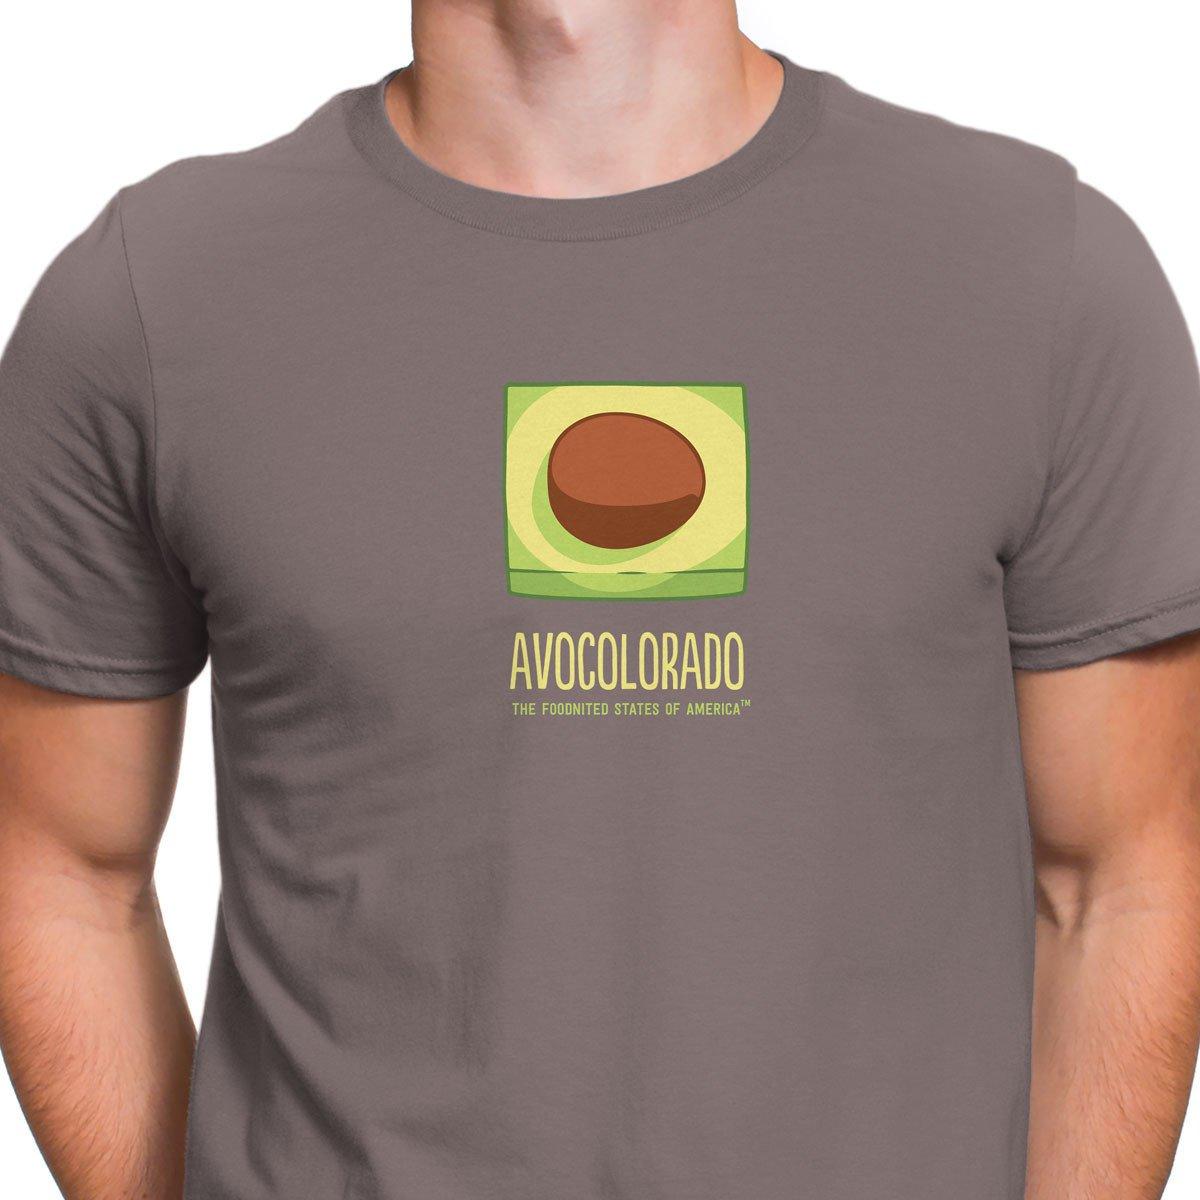 Avocolorado T-shirt, Men's/Unisex